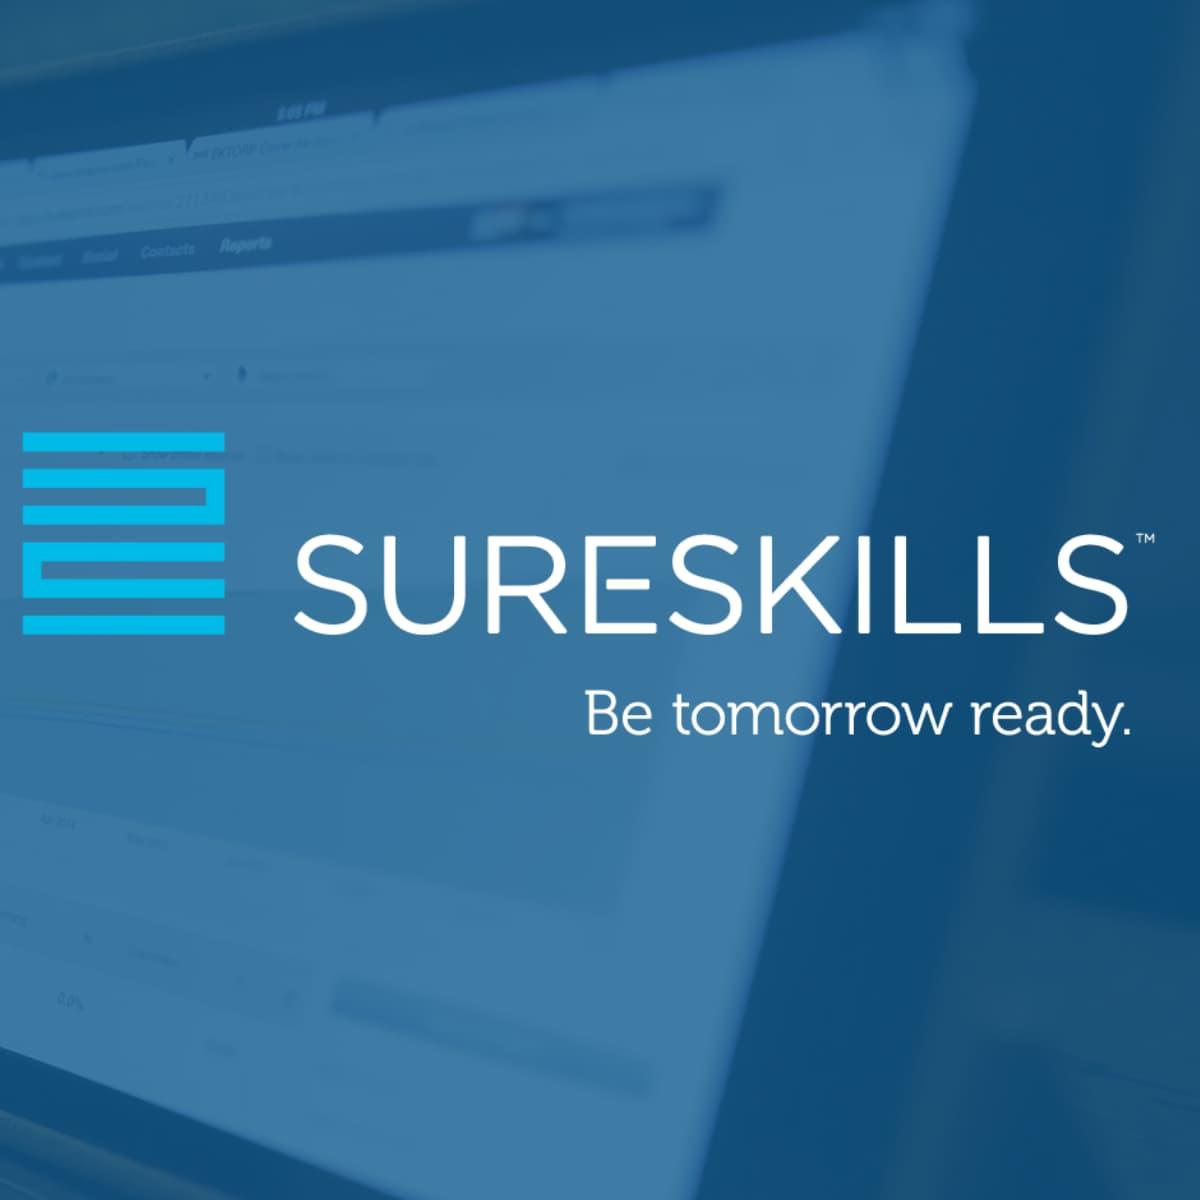 sureskills-bk